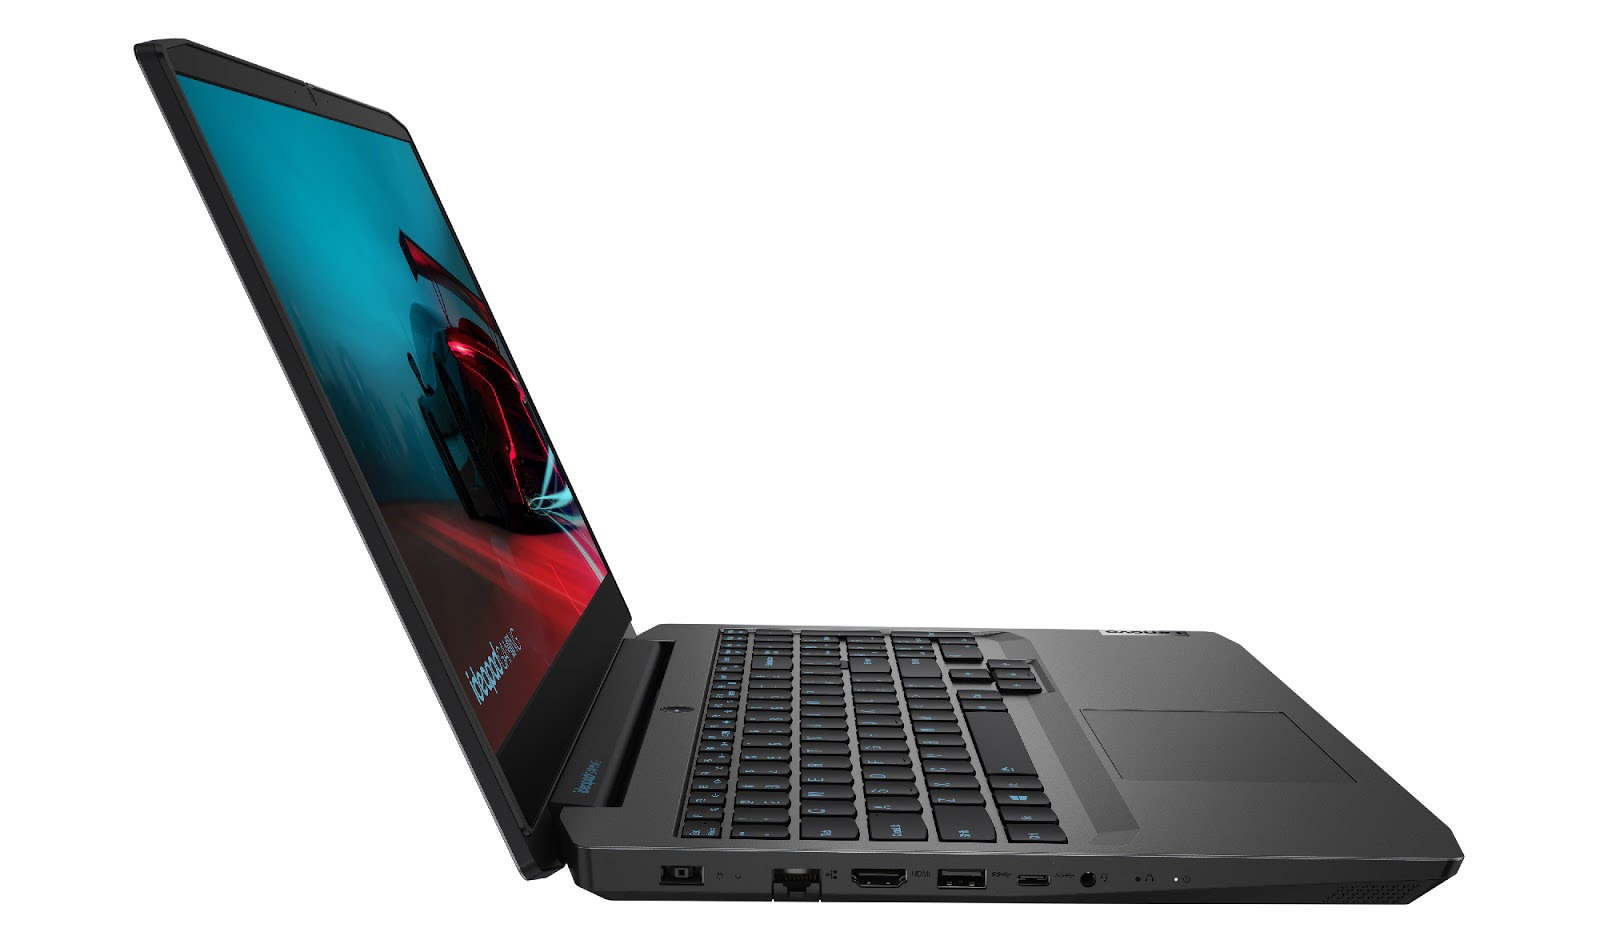 Фото 3. Ноутбук Lenovo ideapad Gaming 3 15IMH05 Onyx Black (81Y400CJRE)